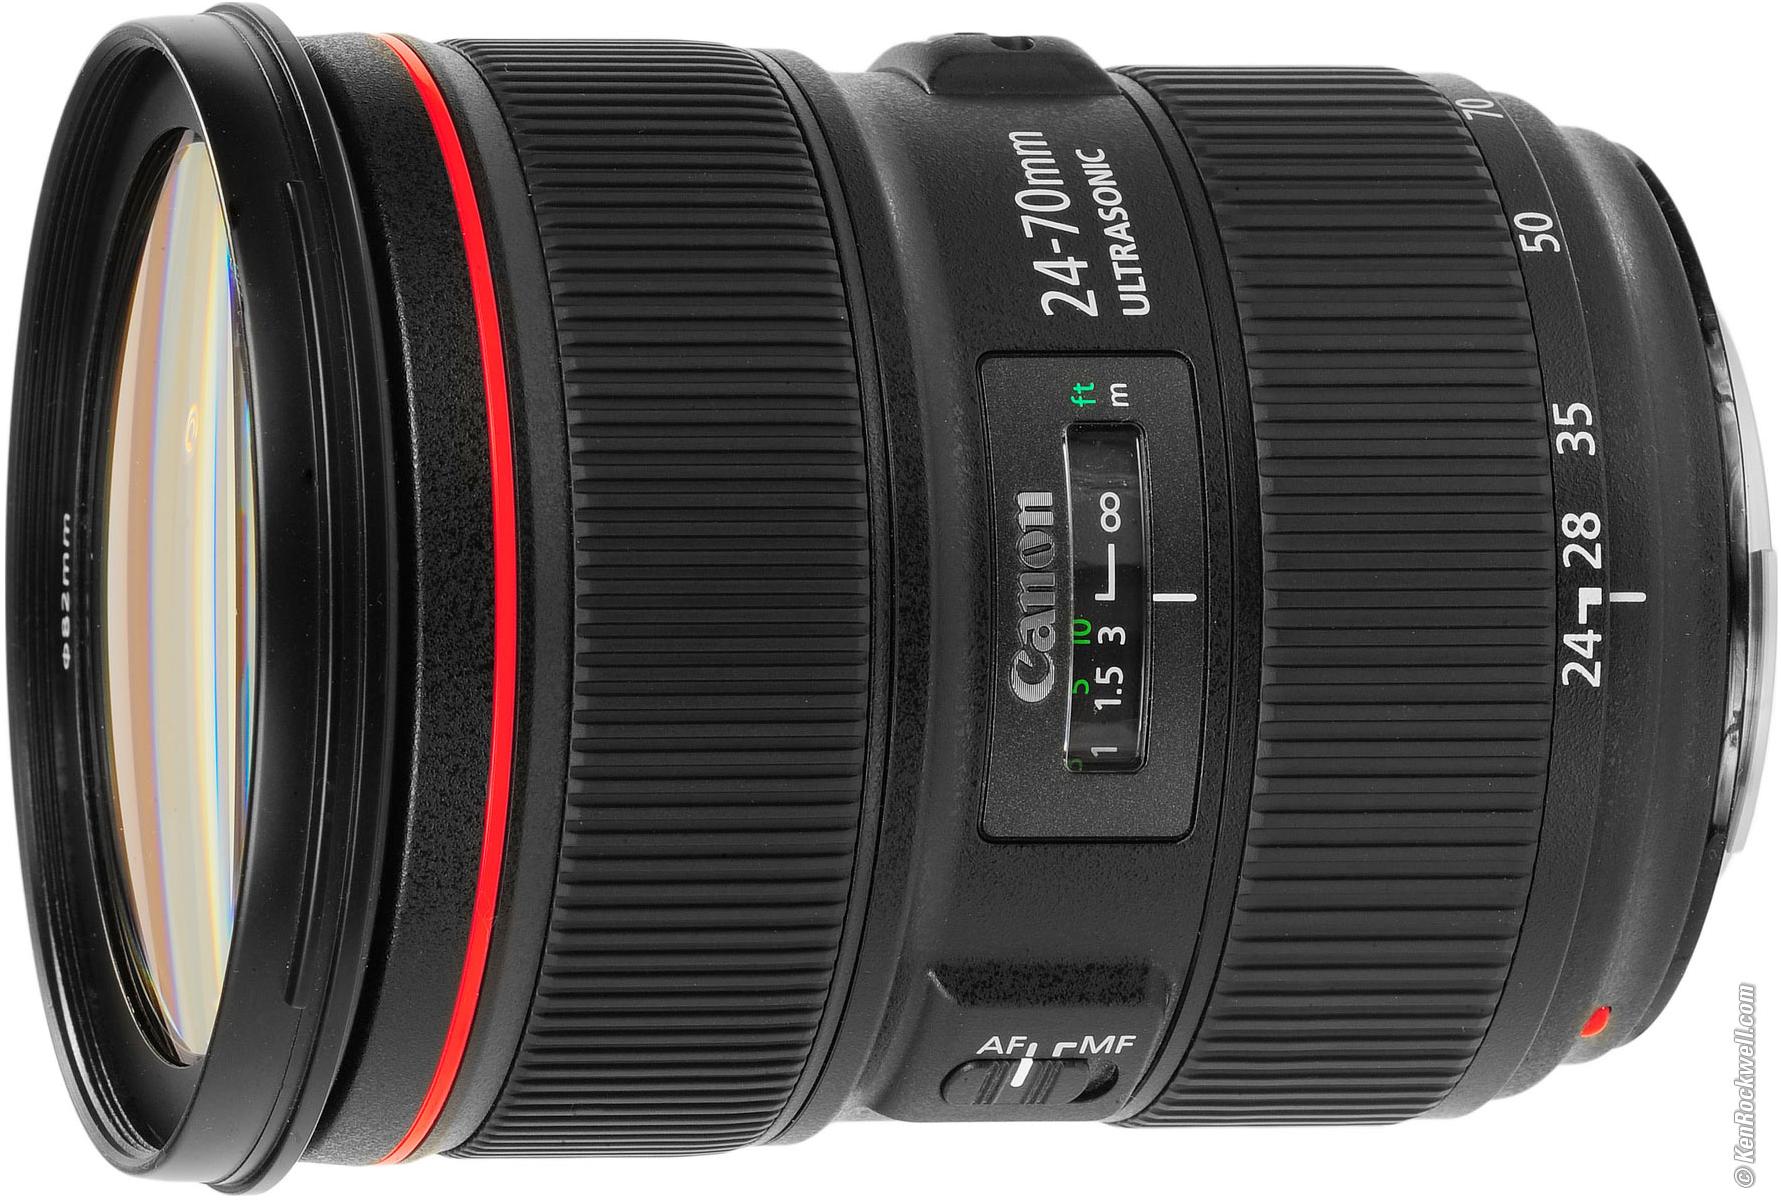 Canon EF 24-70mm f/2.8L II USM – 80 RON